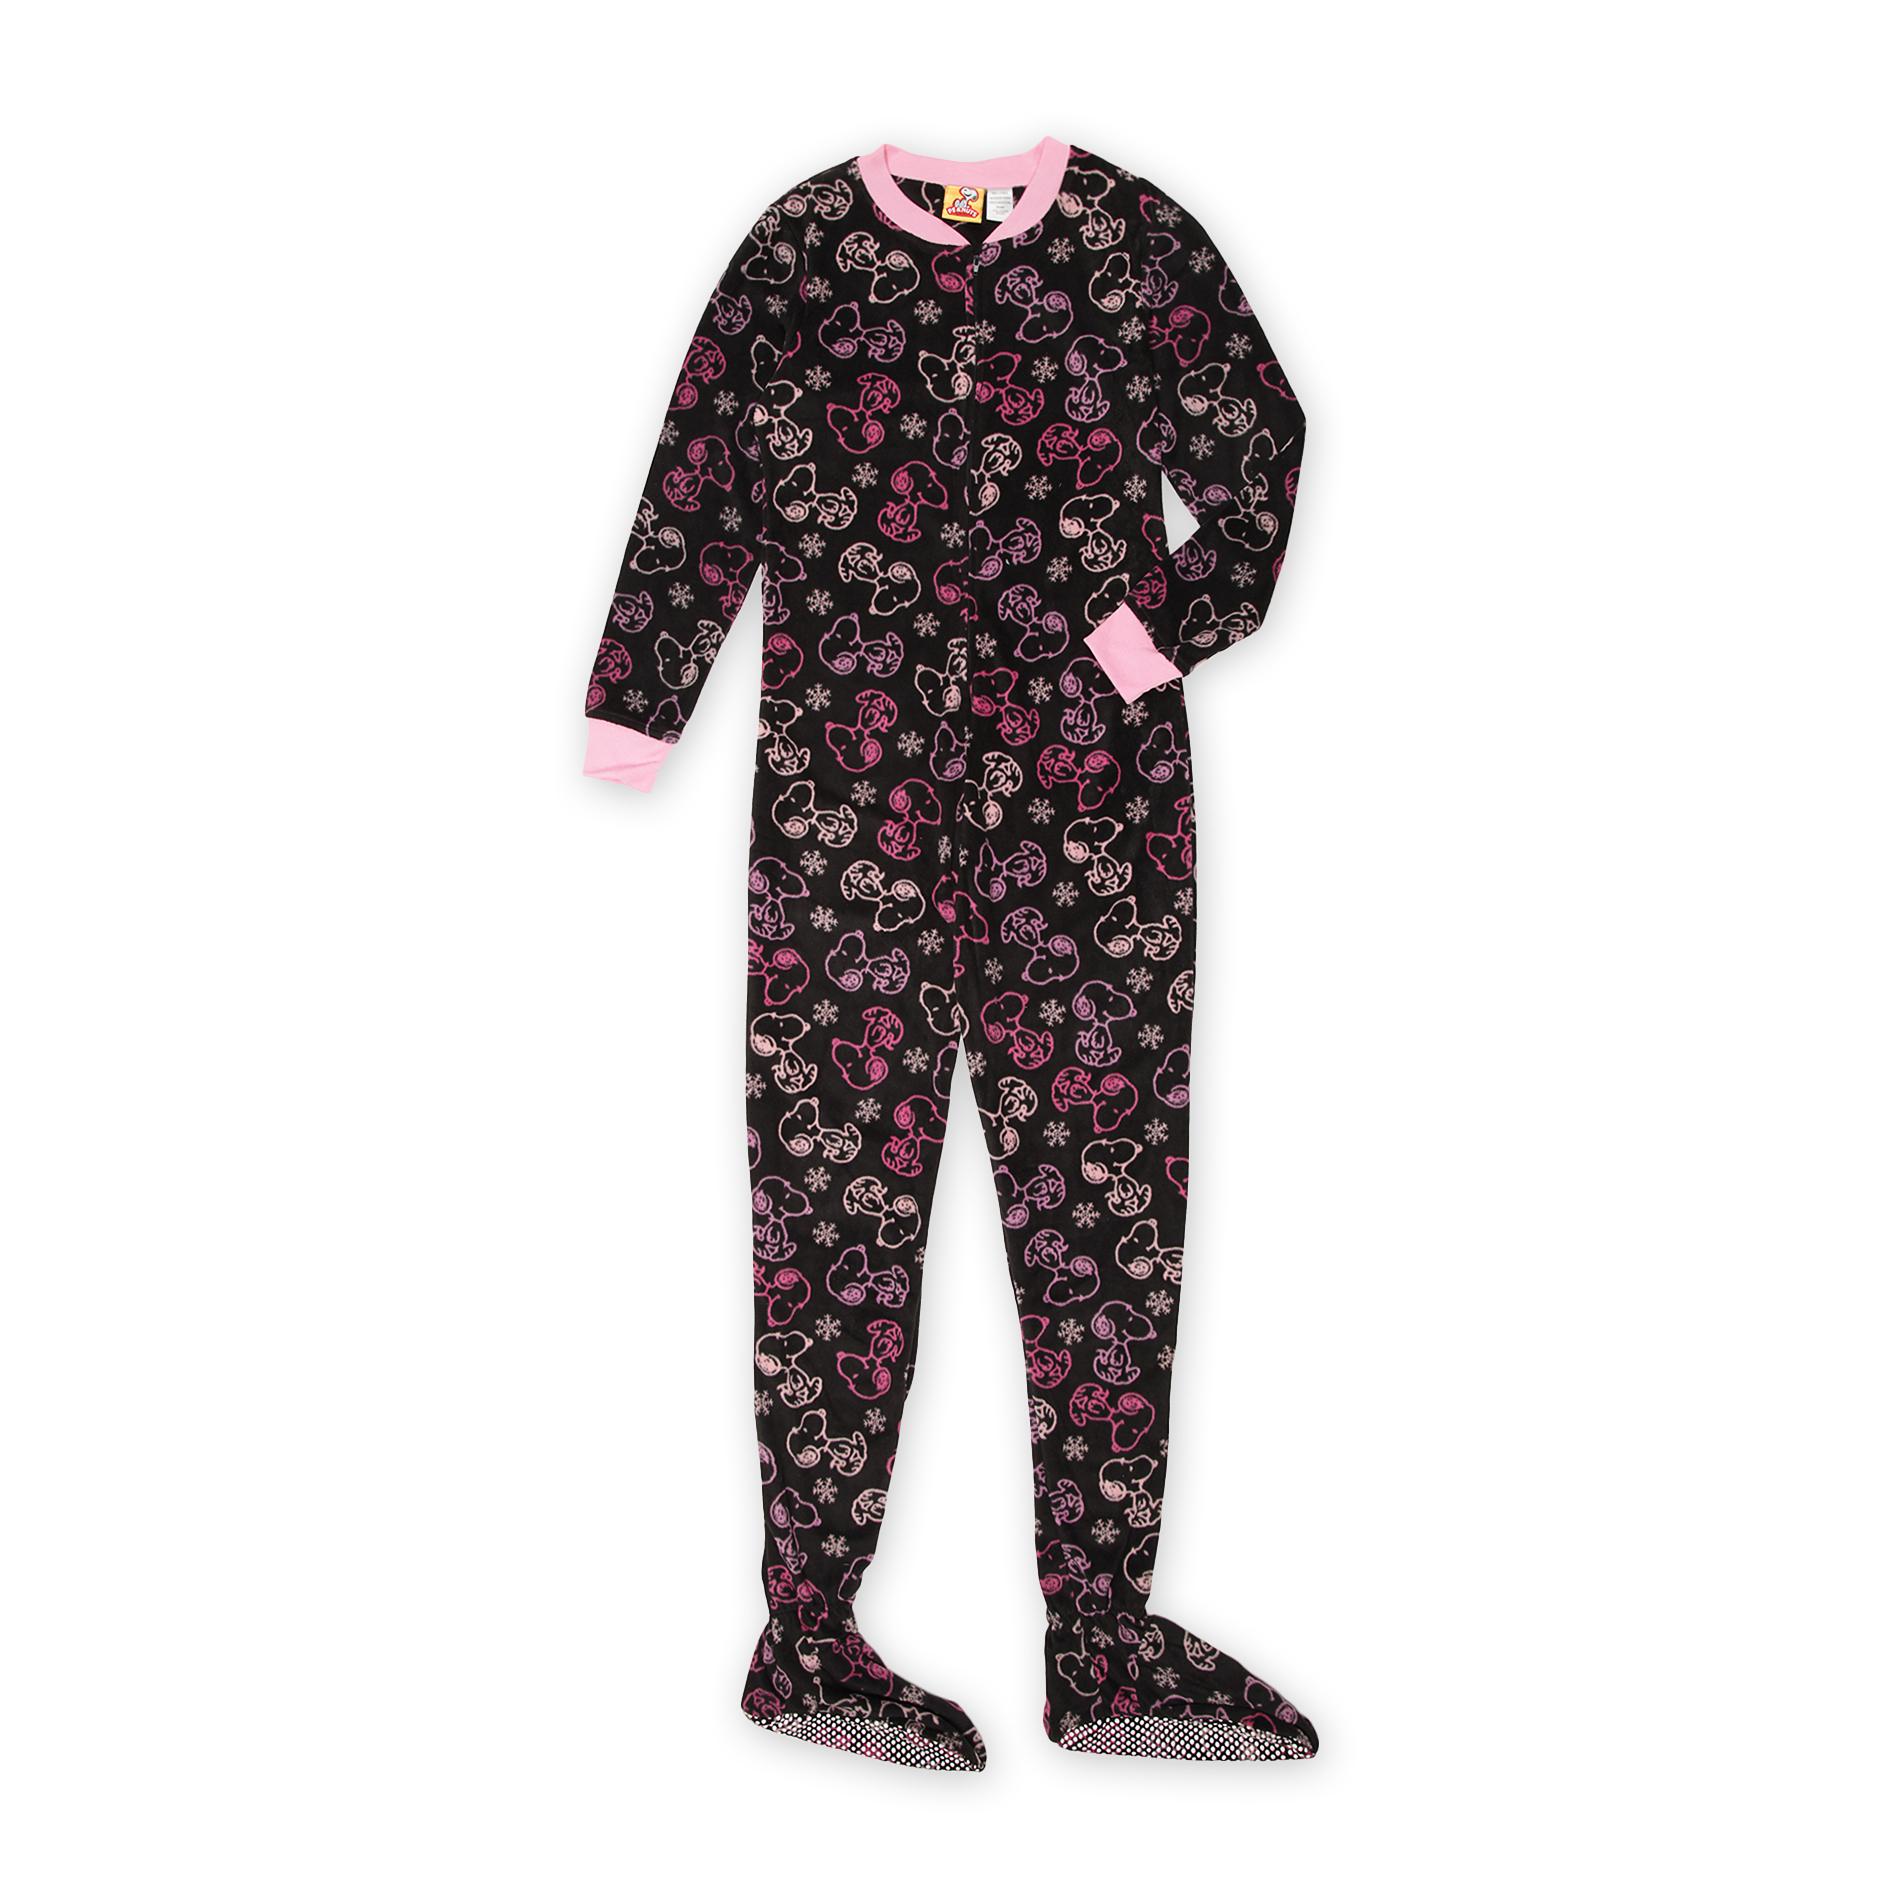 Peanuts Schulz Women' Footie Pajamas - Snoopy